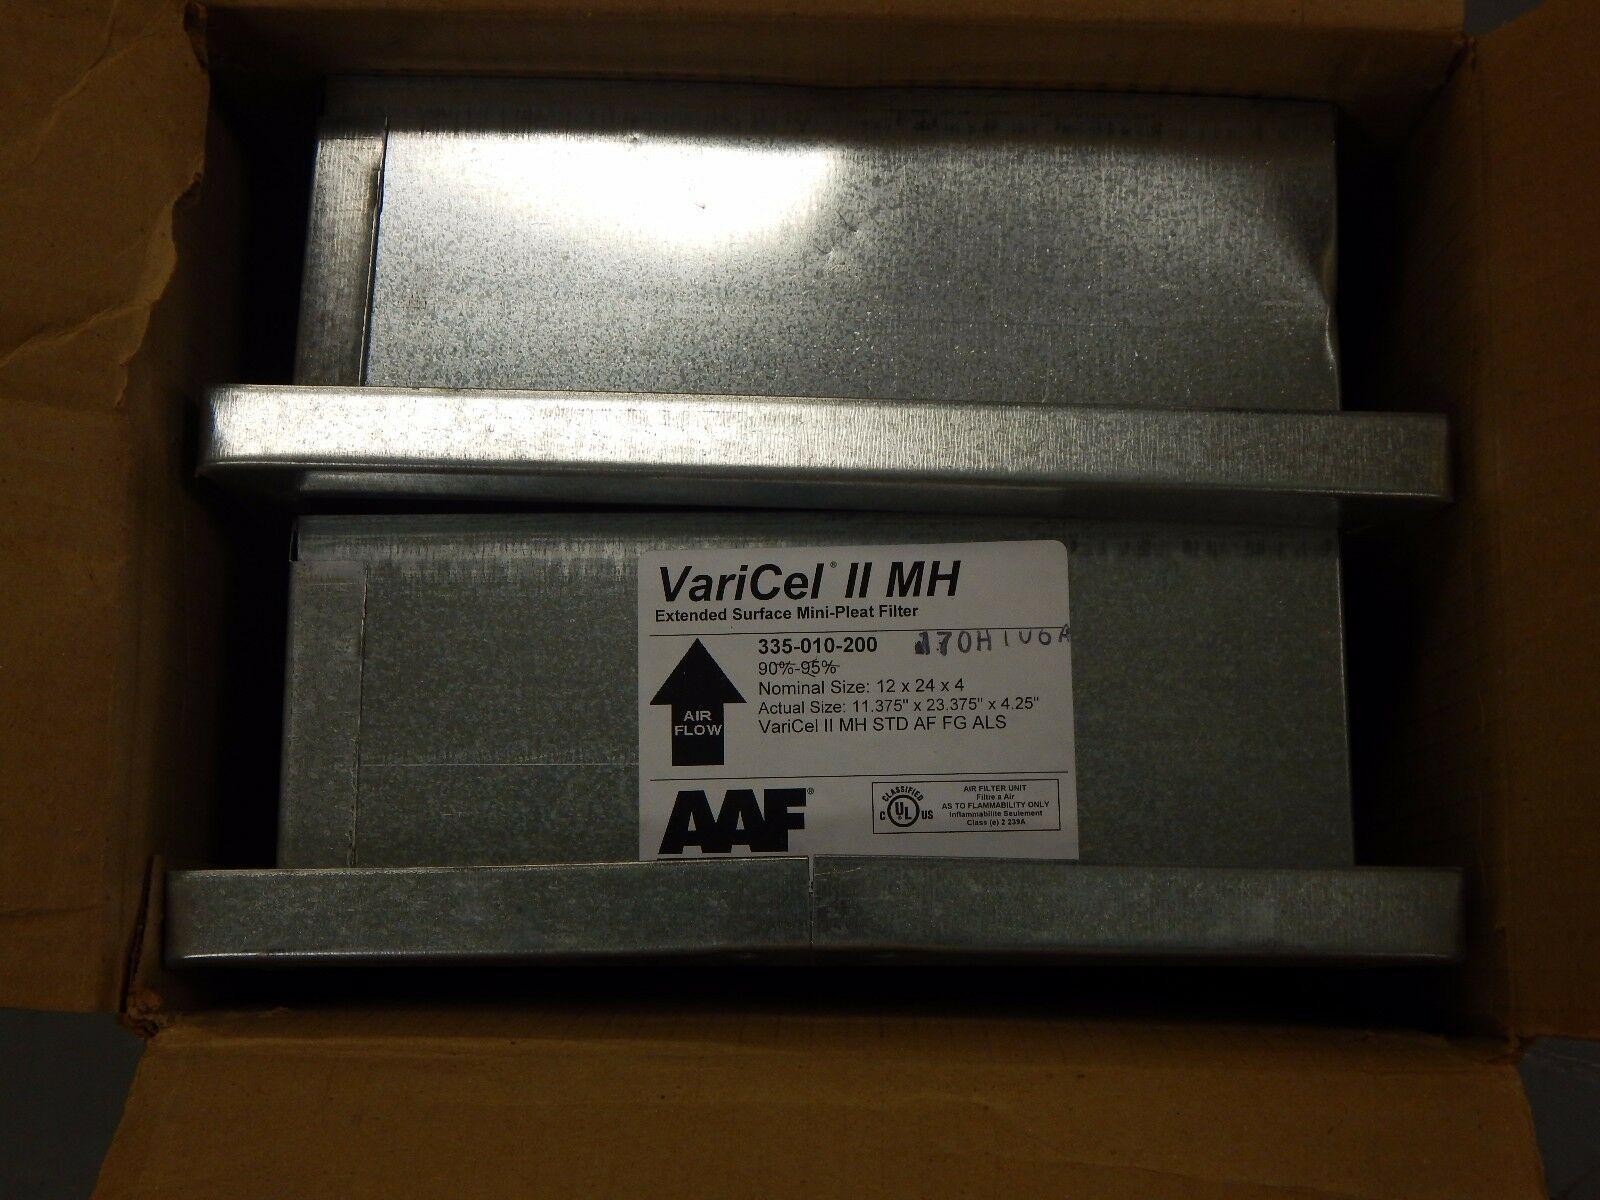 Khung lọc khí AAF Varicel II